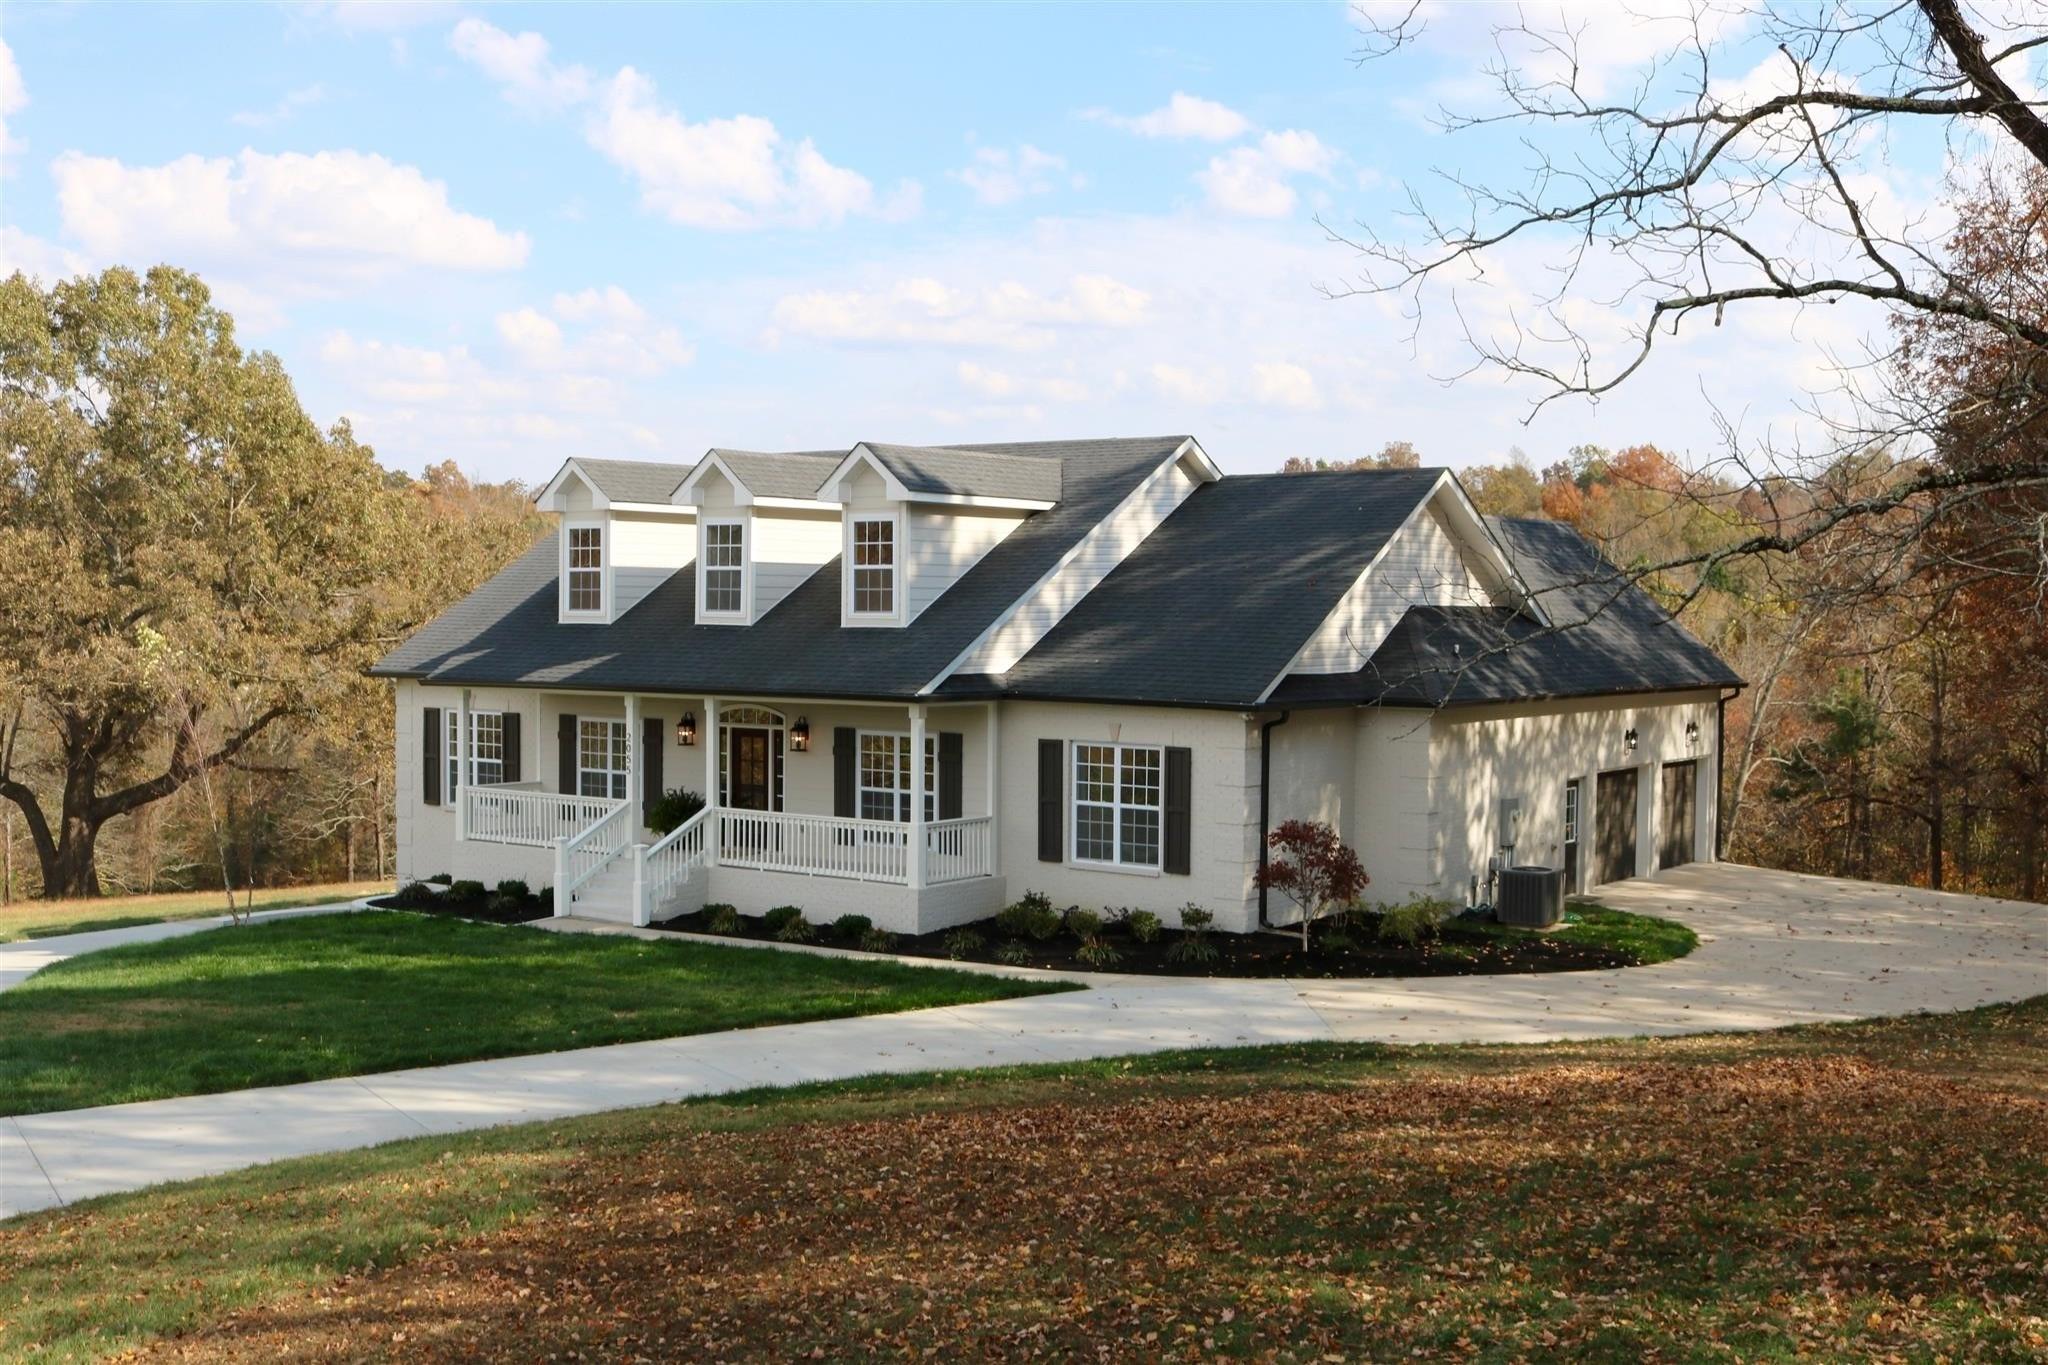 2031 Ferry Rd, Clarksville, TN 37040 - Clarksville, TN real estate listing